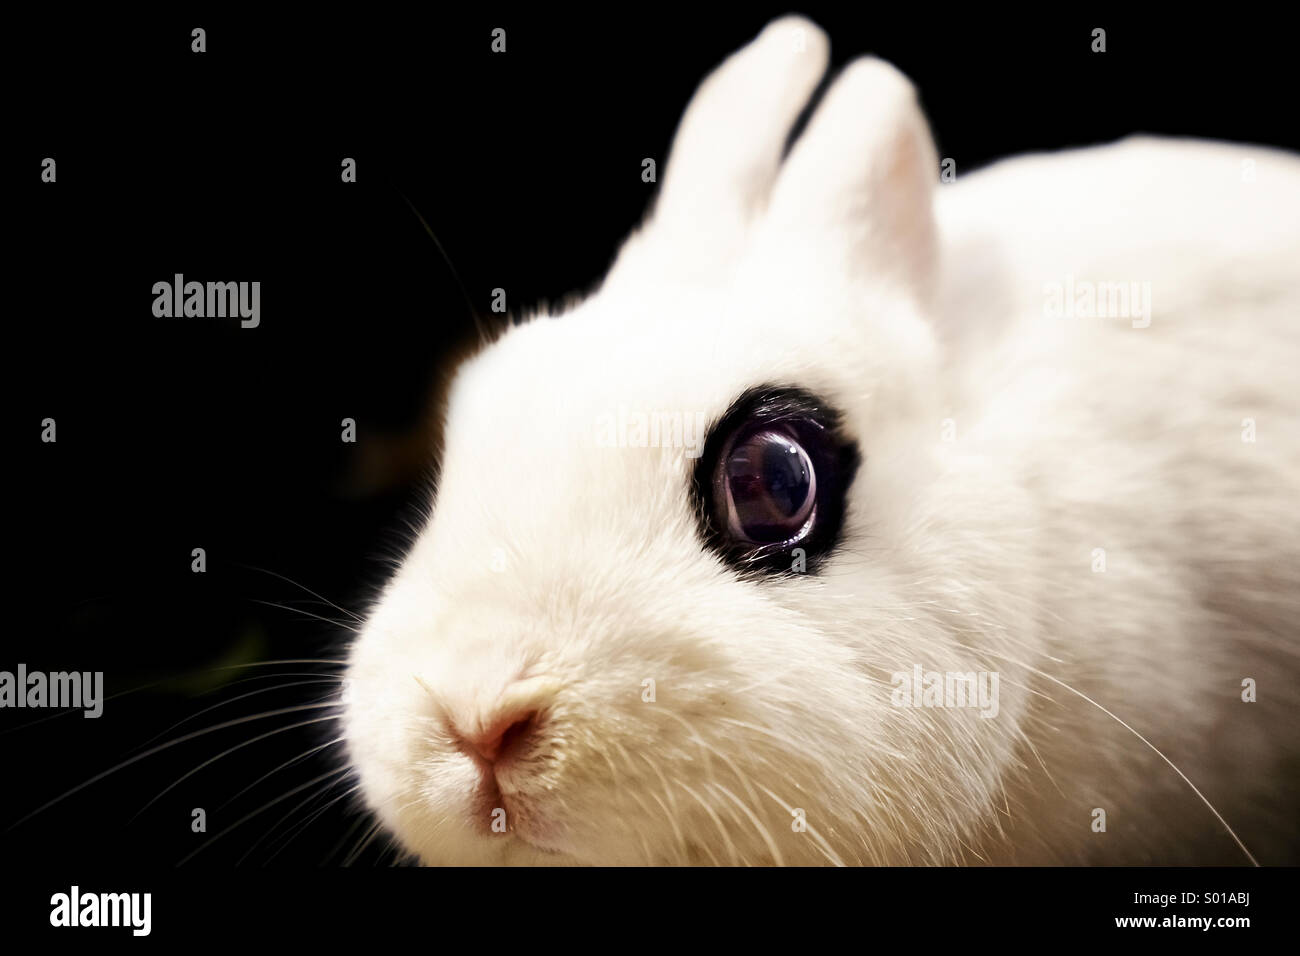 White rabbit close up - Stock Image